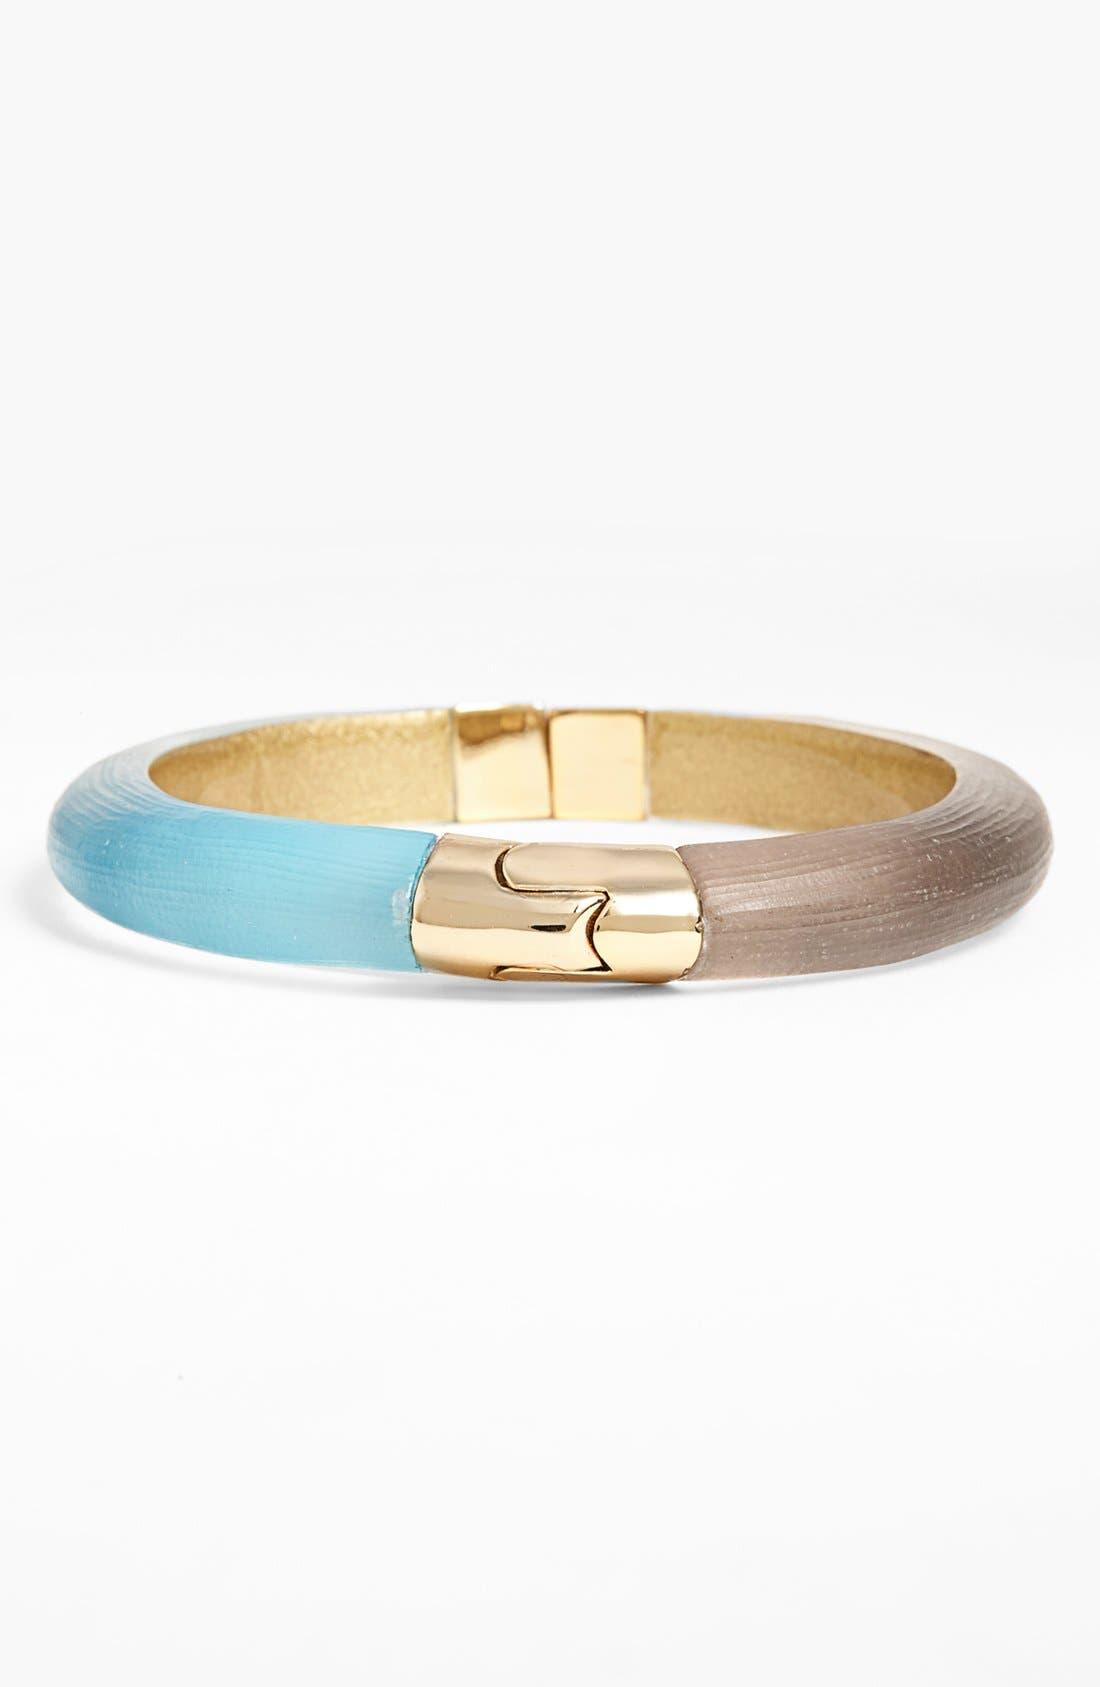 Alternate Image 1 Selected - Alexis Bittar Lucite® Hinged Bangle Bracelet